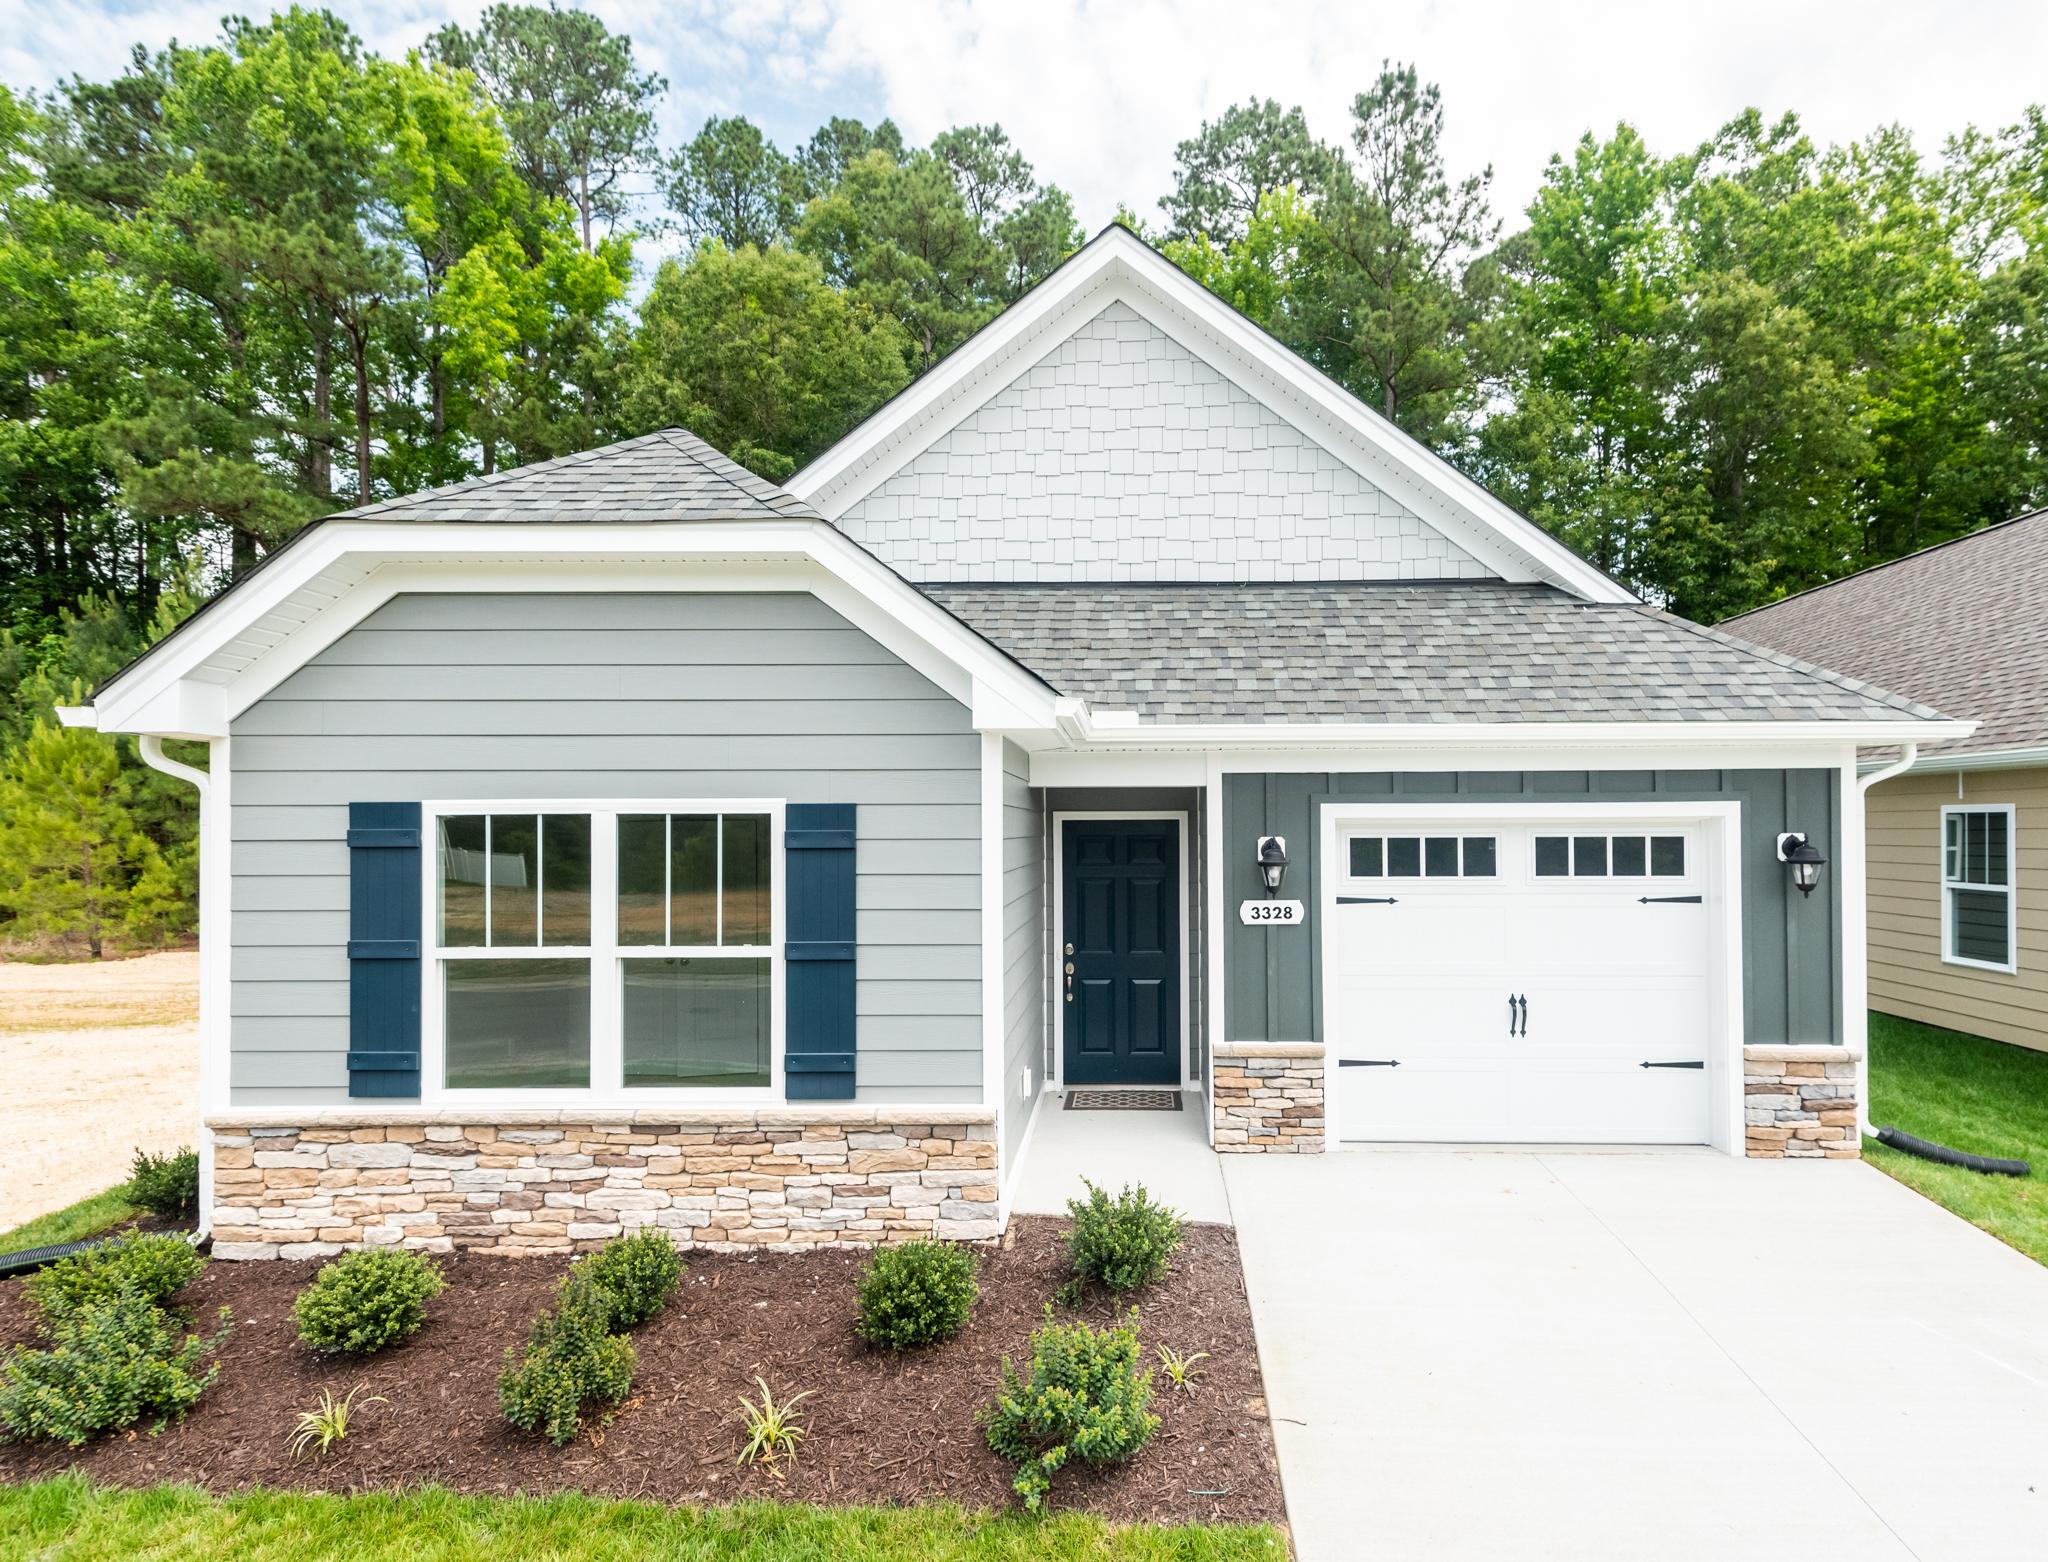 Virginia real estate Photographer-_DSC7142-1